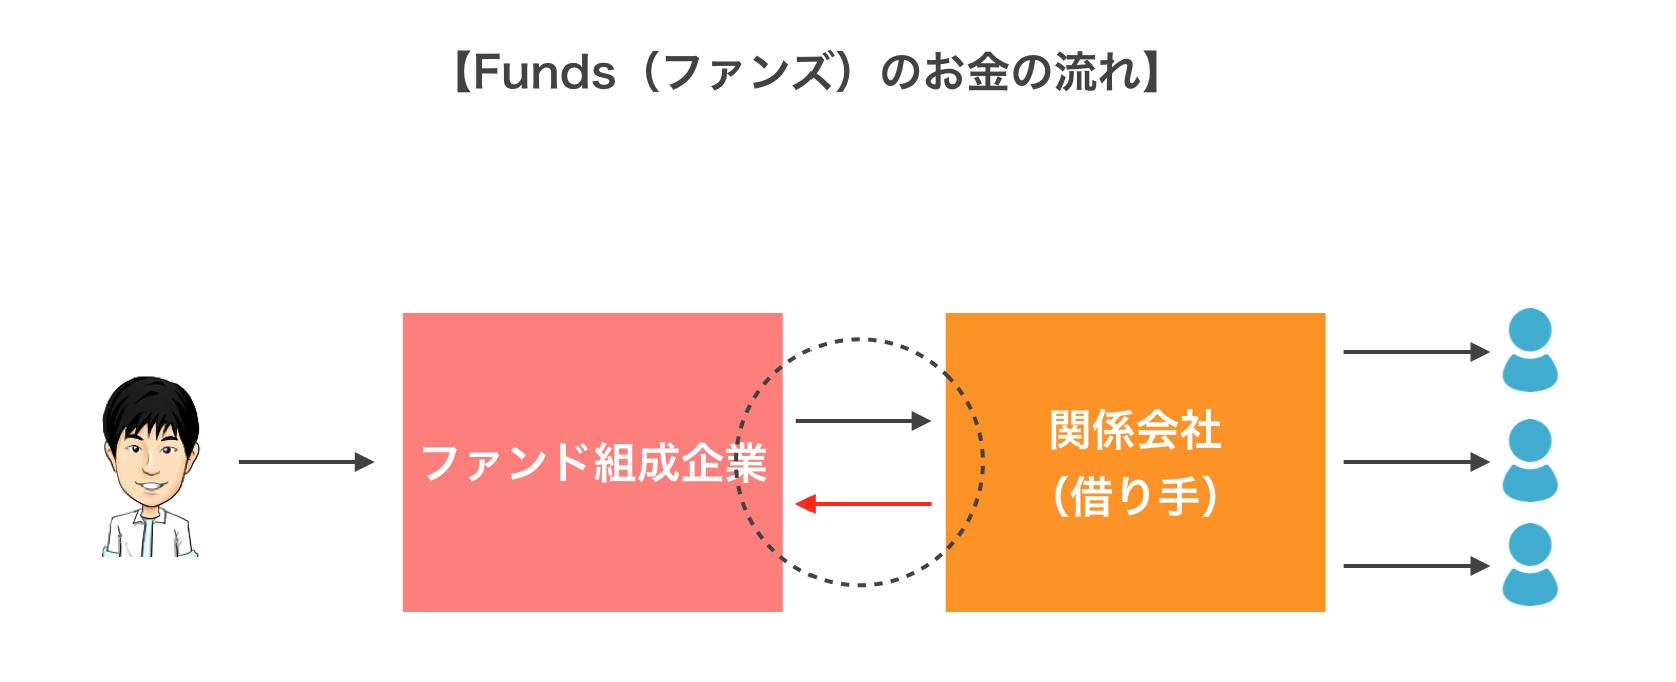 Fundsの仕組み図解